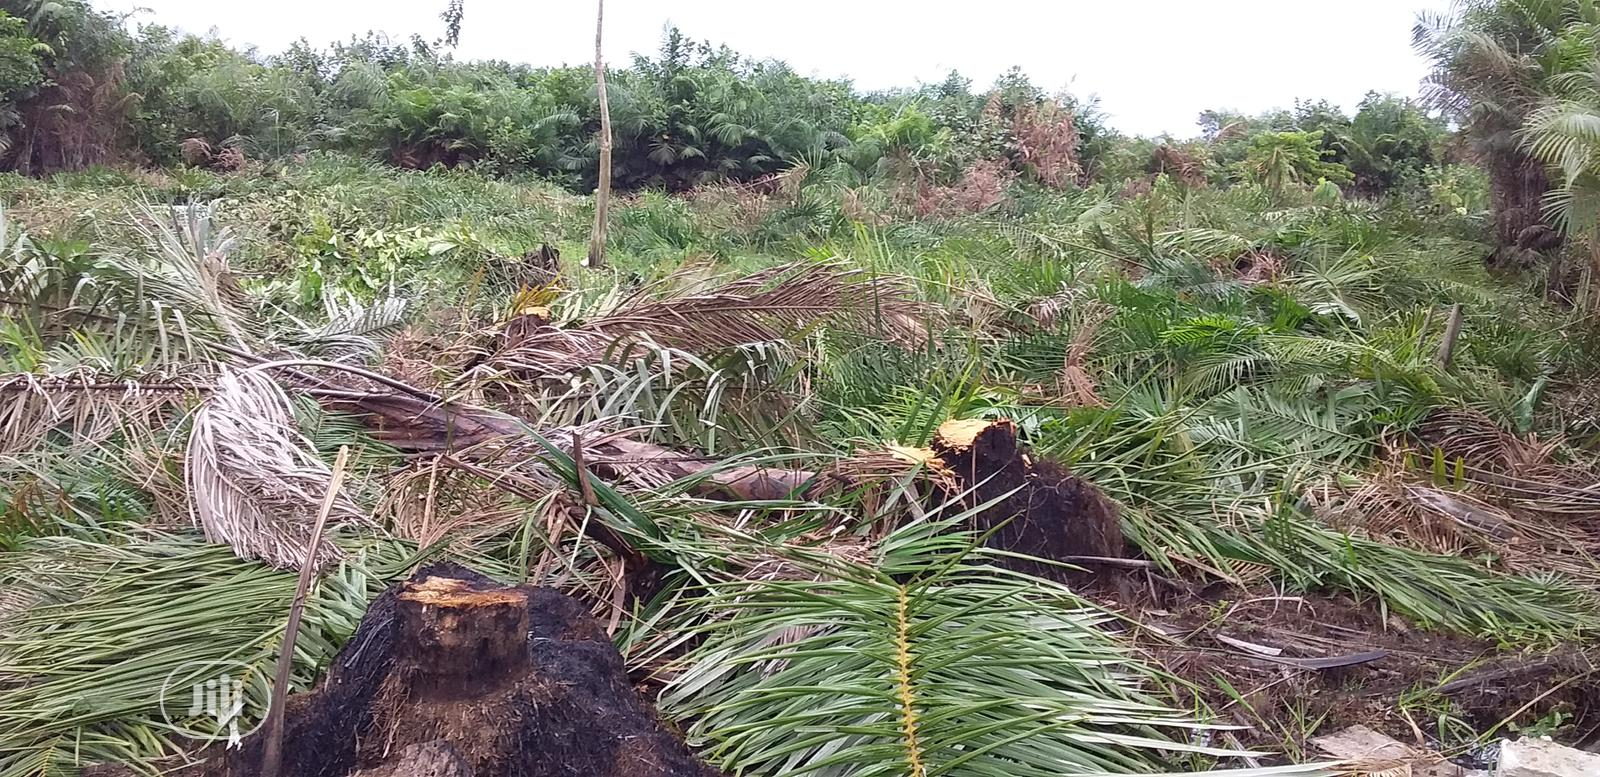 4 Plots of Land Going for 2.5 Million in Ibeju Lekki.